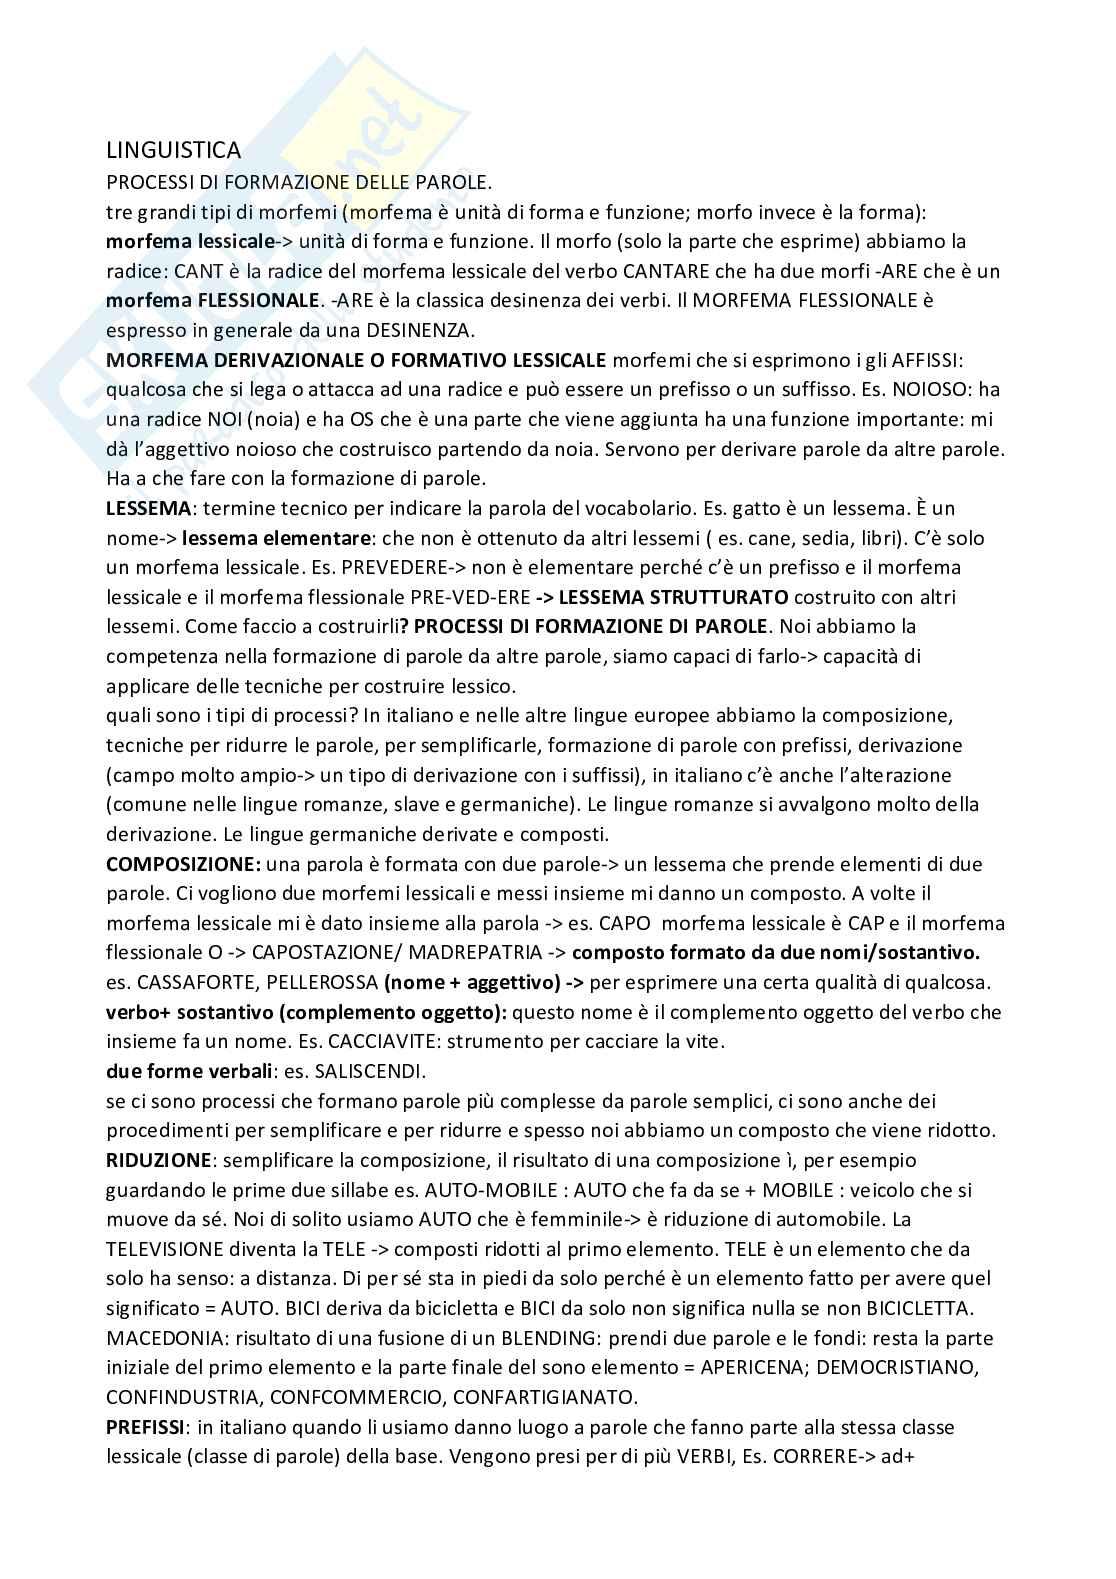 Linguistica generale - appunti Pag. 1